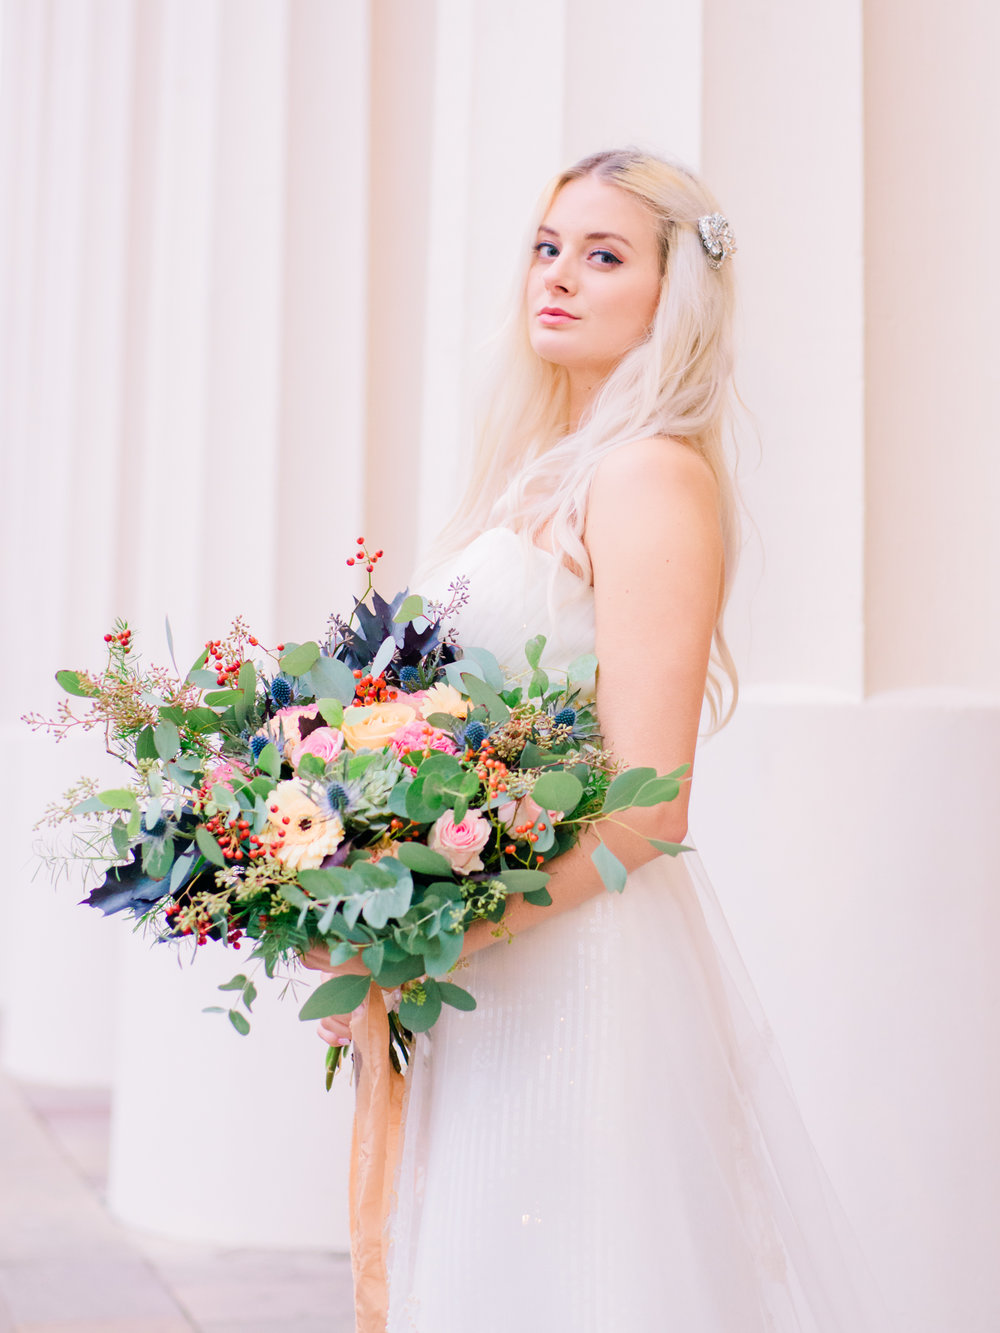 Elegant Organic Fall Swedish Bridal Wedding Styled Shoot - Erika Alvarenga Photography-63.jpg